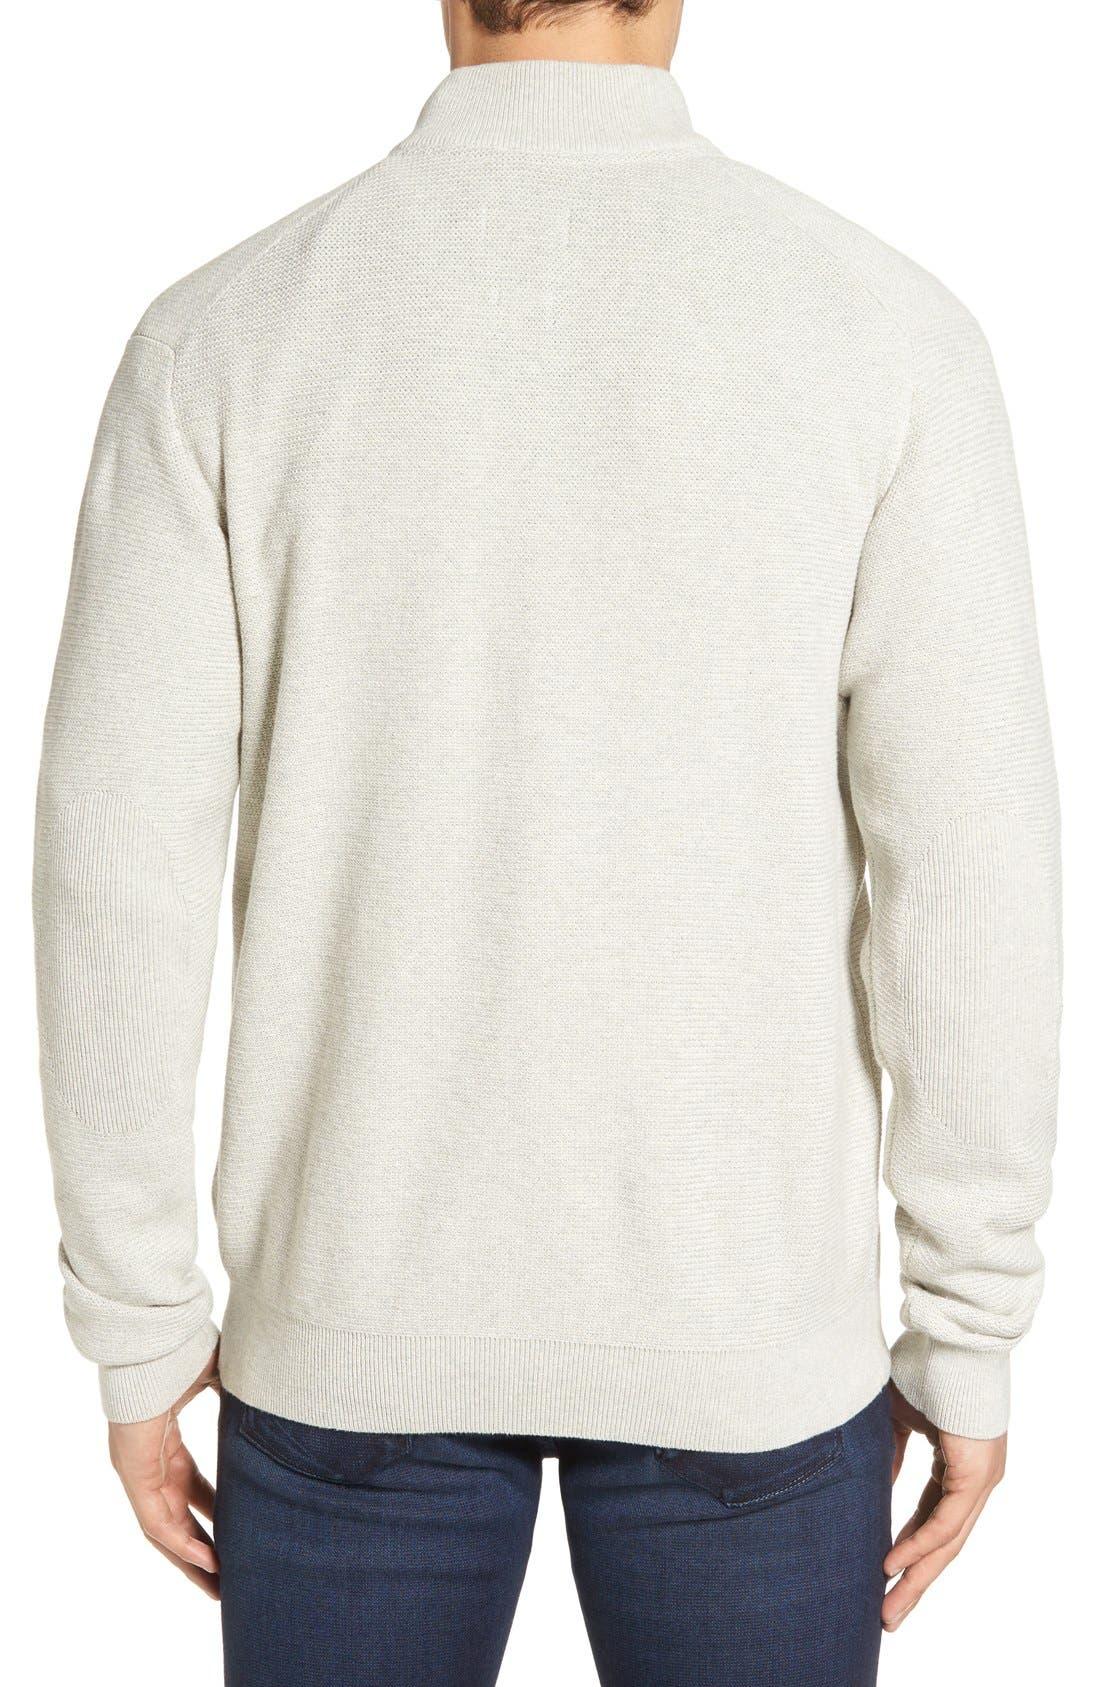 'Benson' Quarter Zip Textured Knit Sweater,                             Alternate thumbnail 13, color,